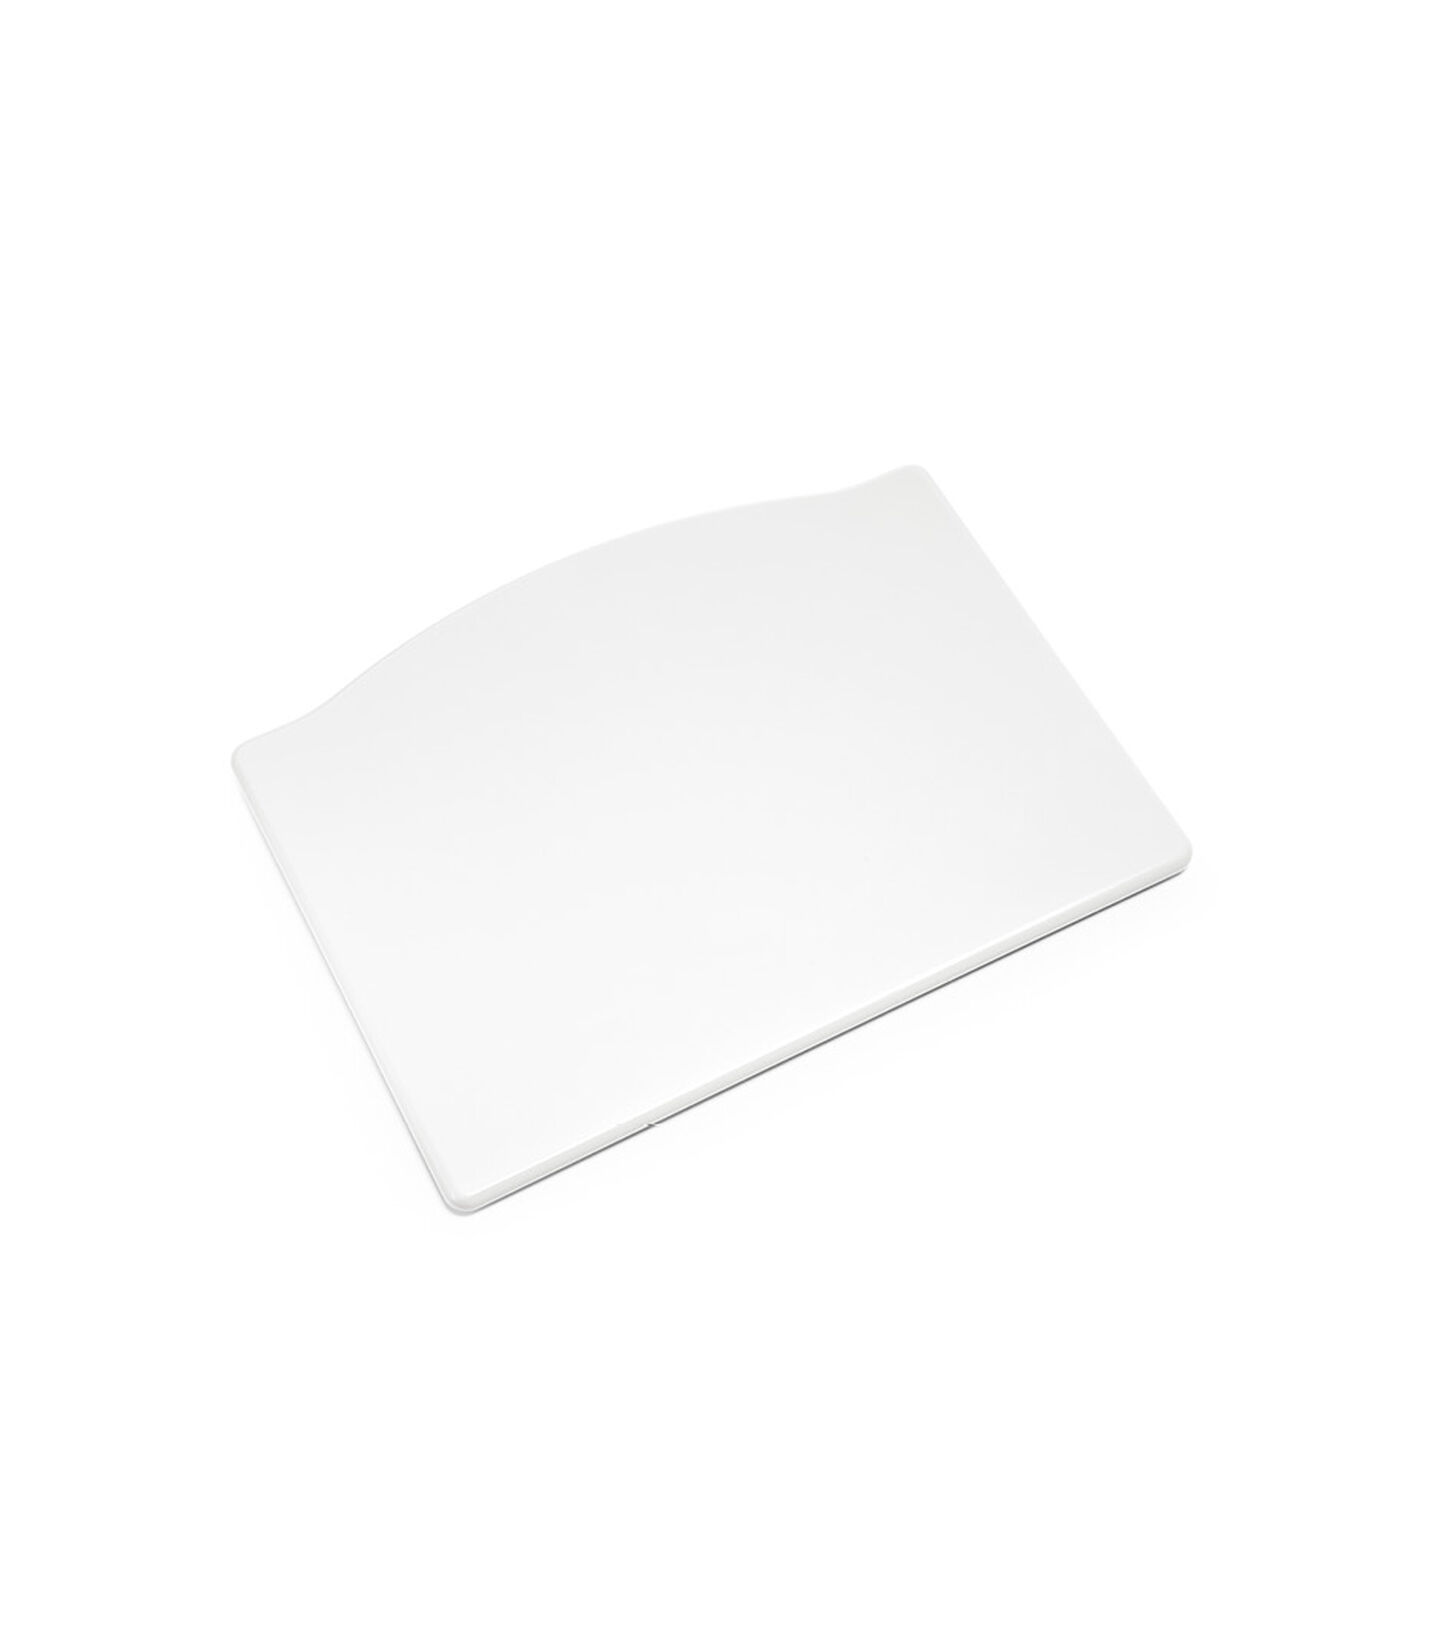 Tripp Trapp® Voetenplank White, Wit, mainview view 1